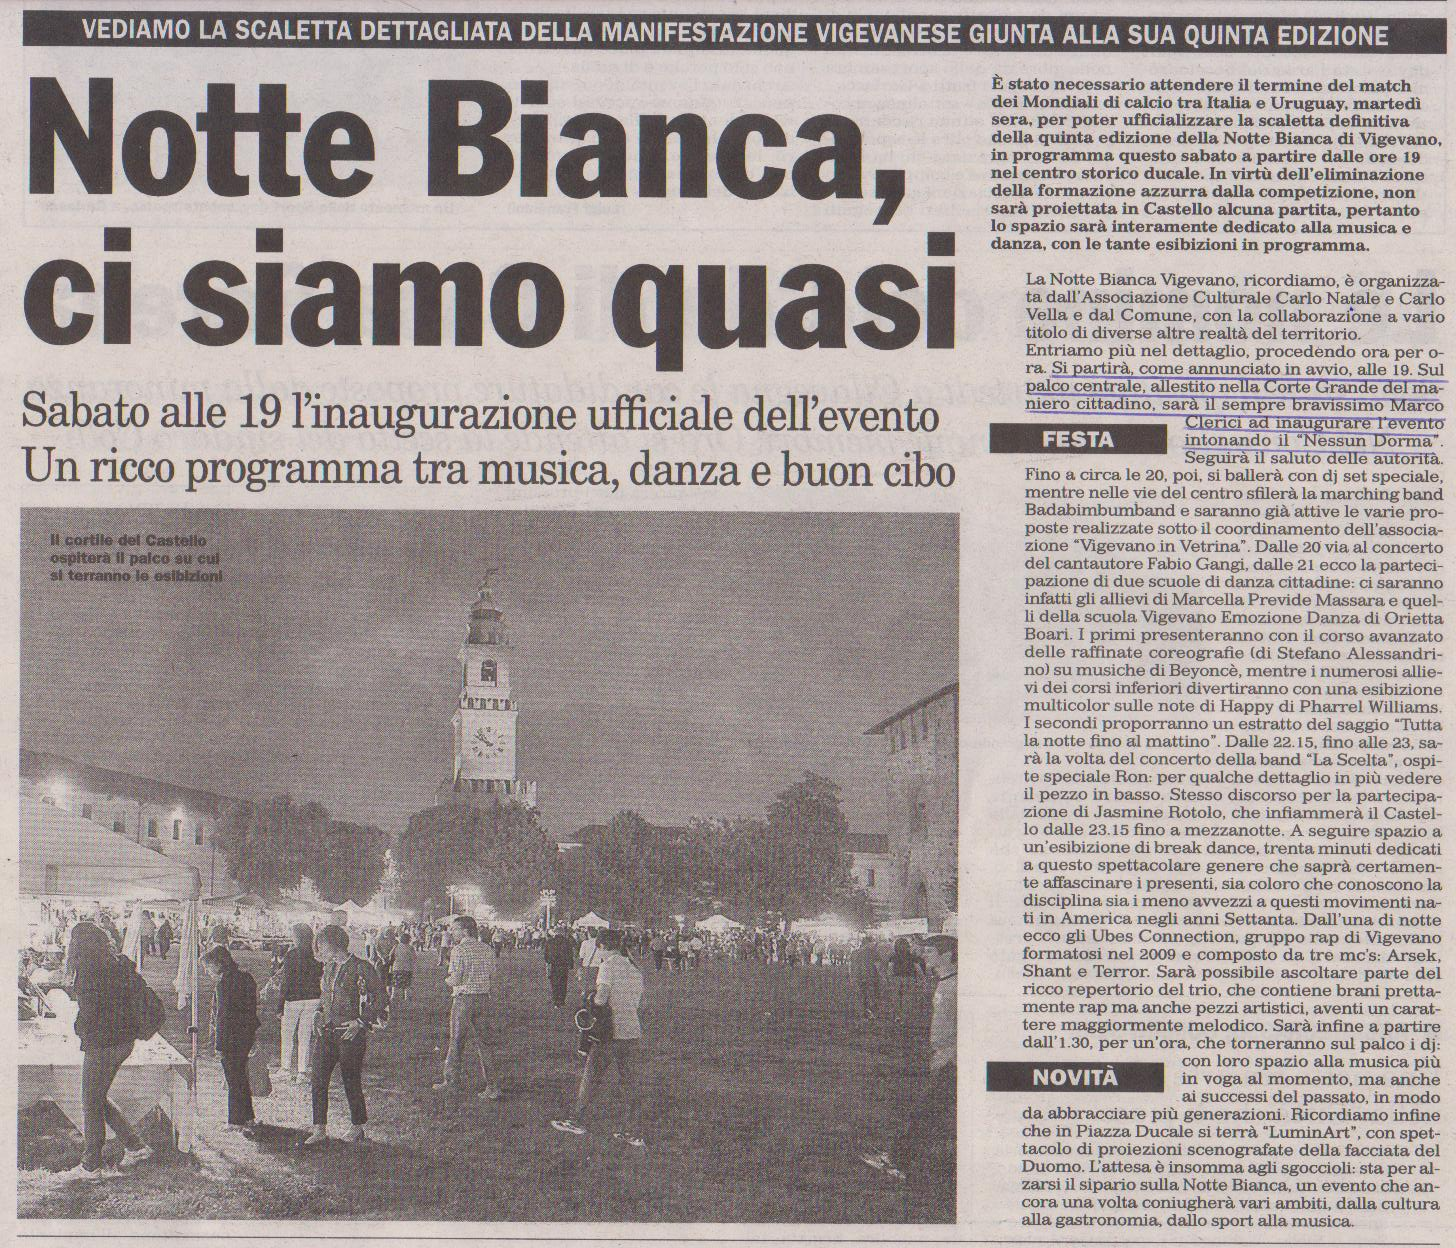 Scaletta Finale per la Notte Bianca 2014